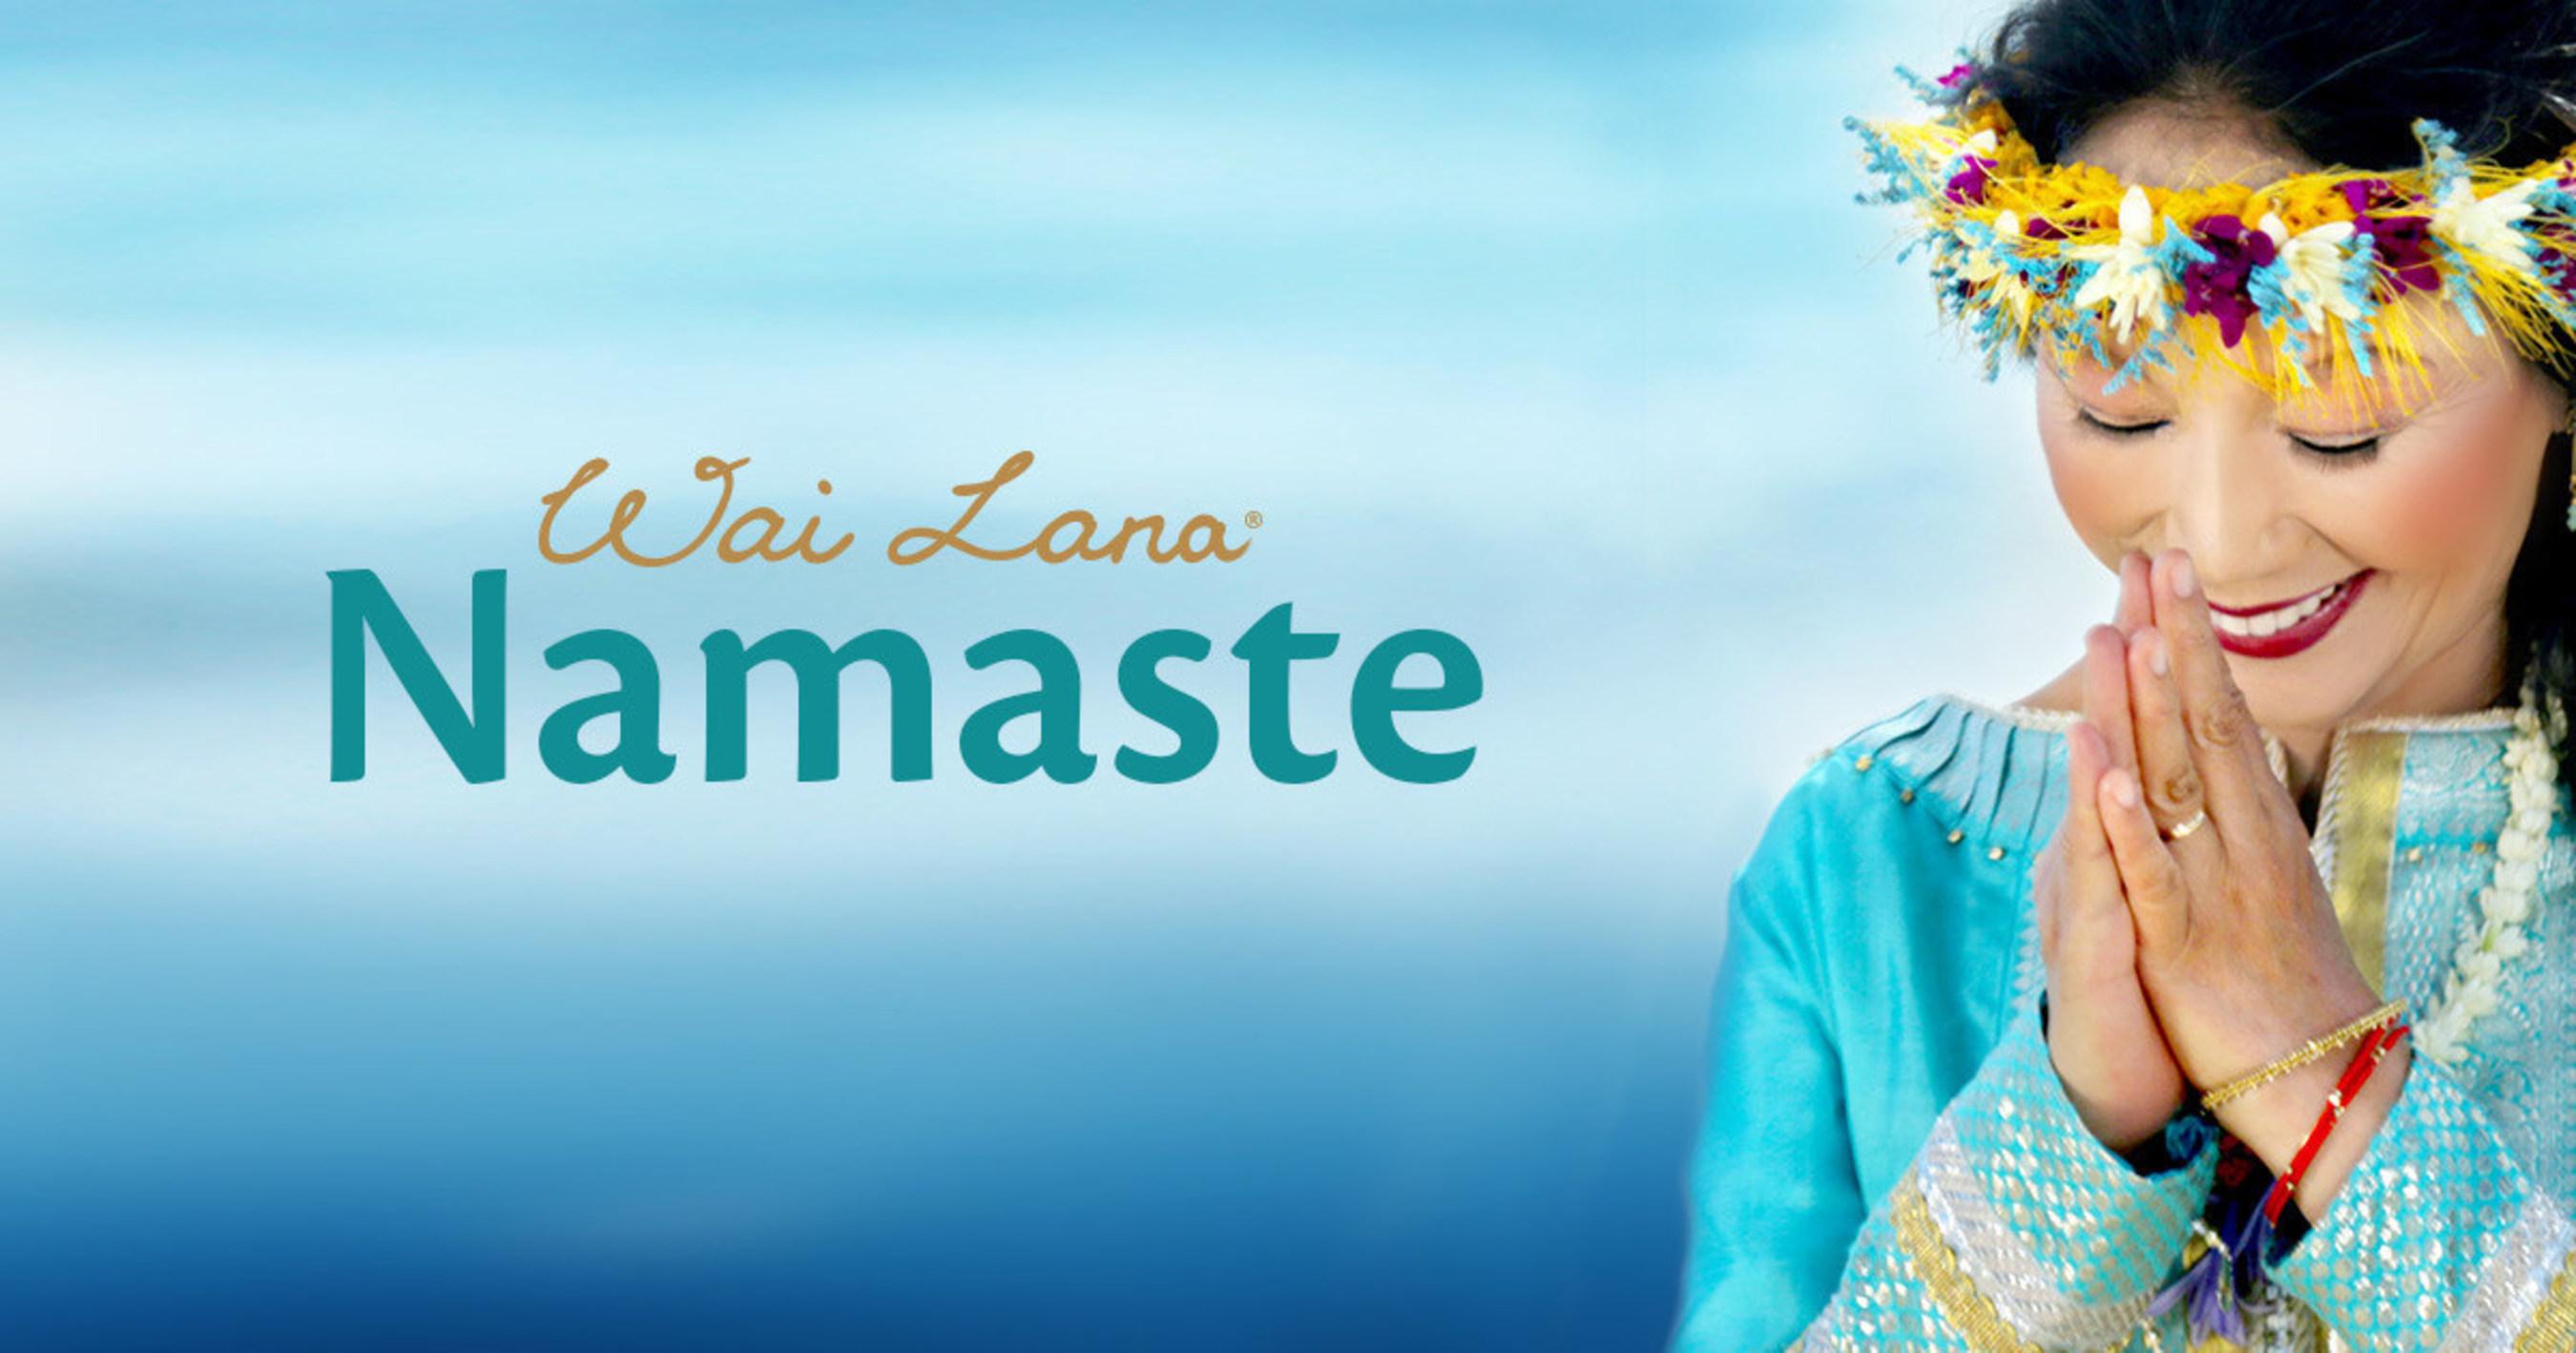 Namaste Music Video Released By Yoga Icon Wai Lana In Celebration